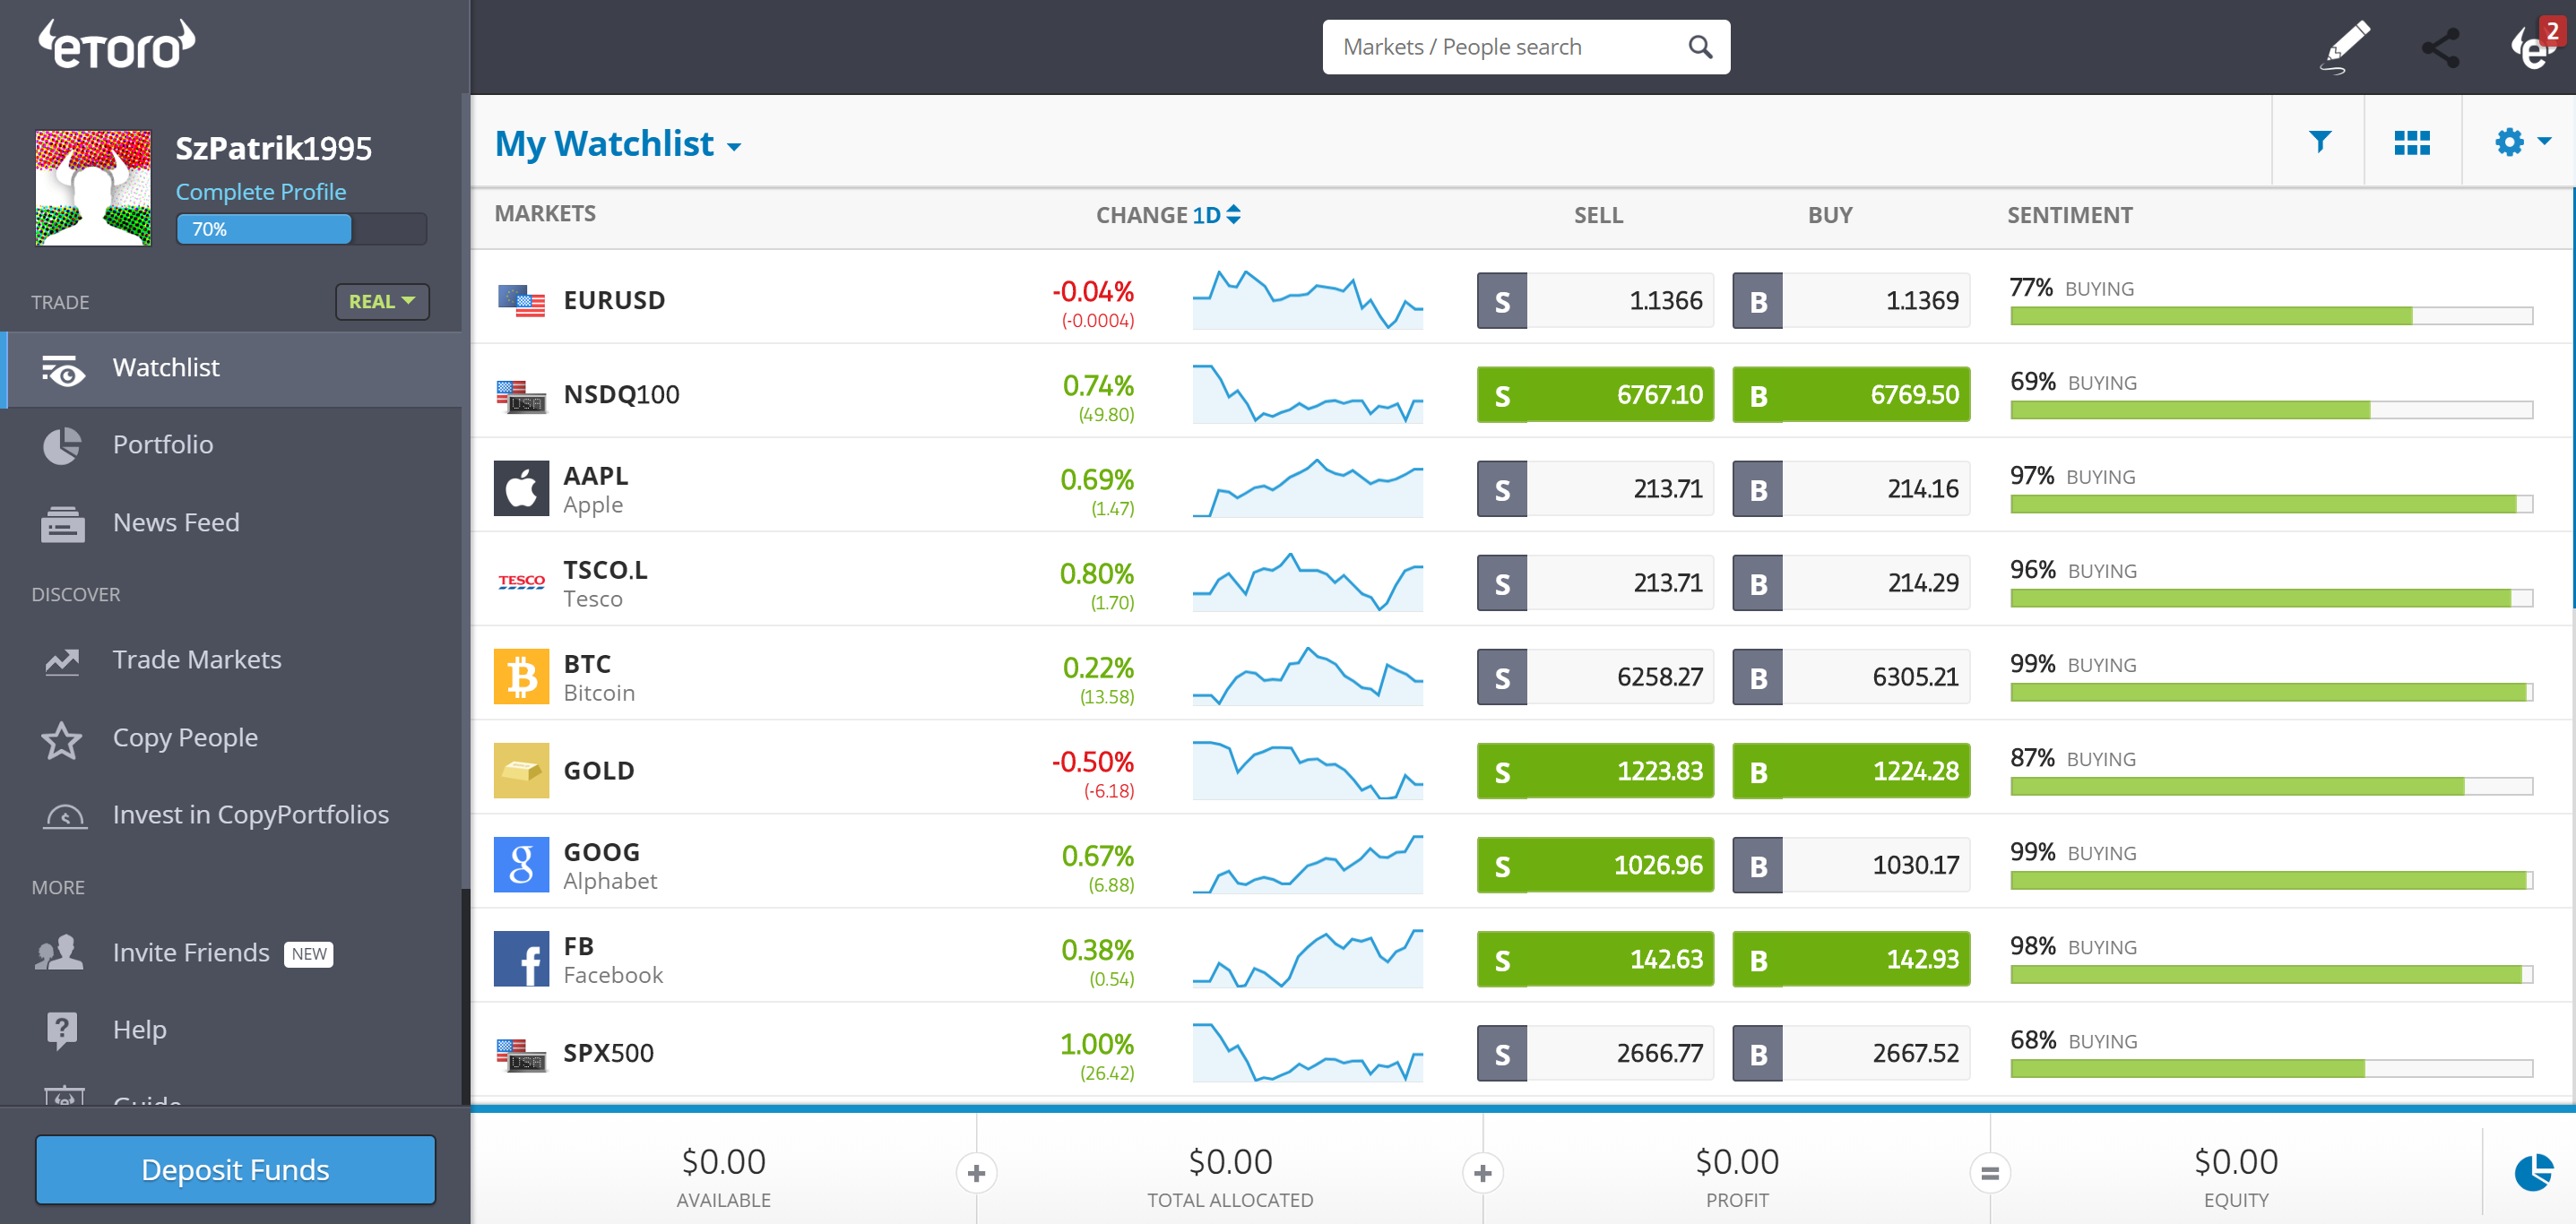 How to invest in stocks - eToro web trading platform